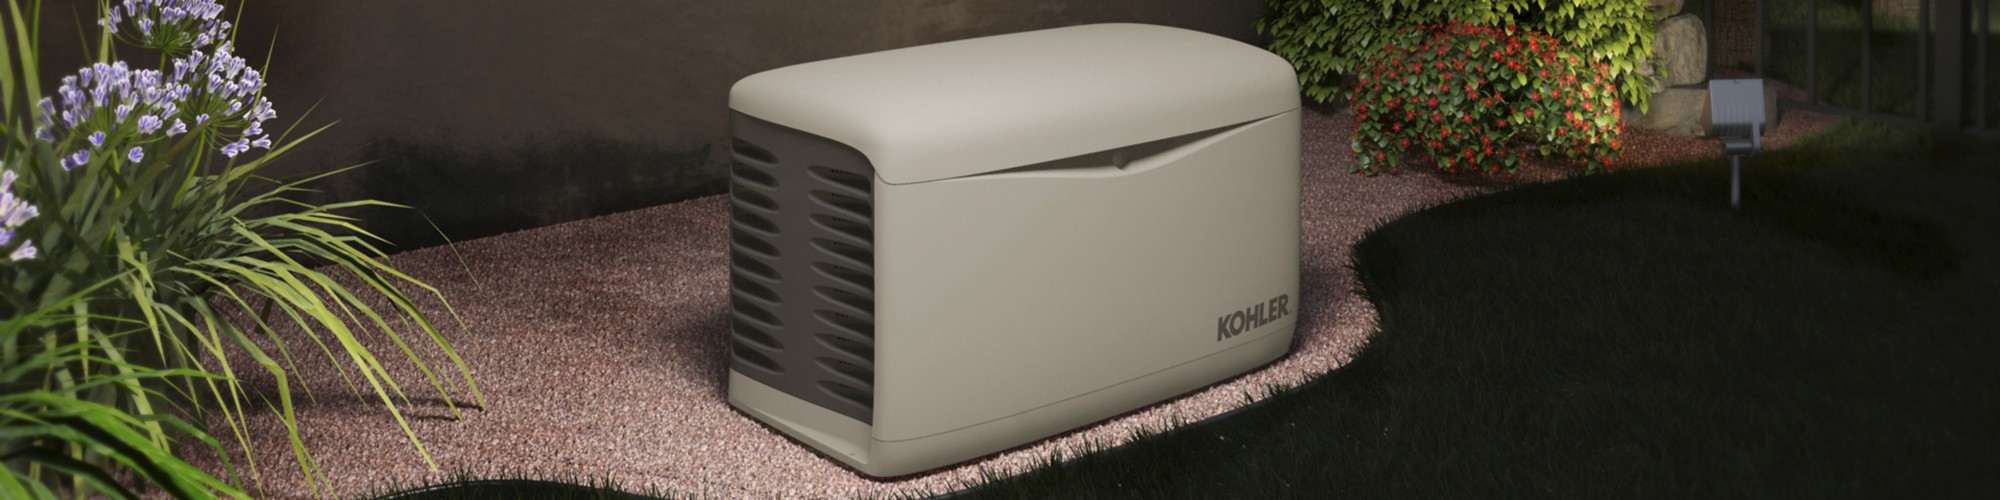 Kohler Generator outside a home